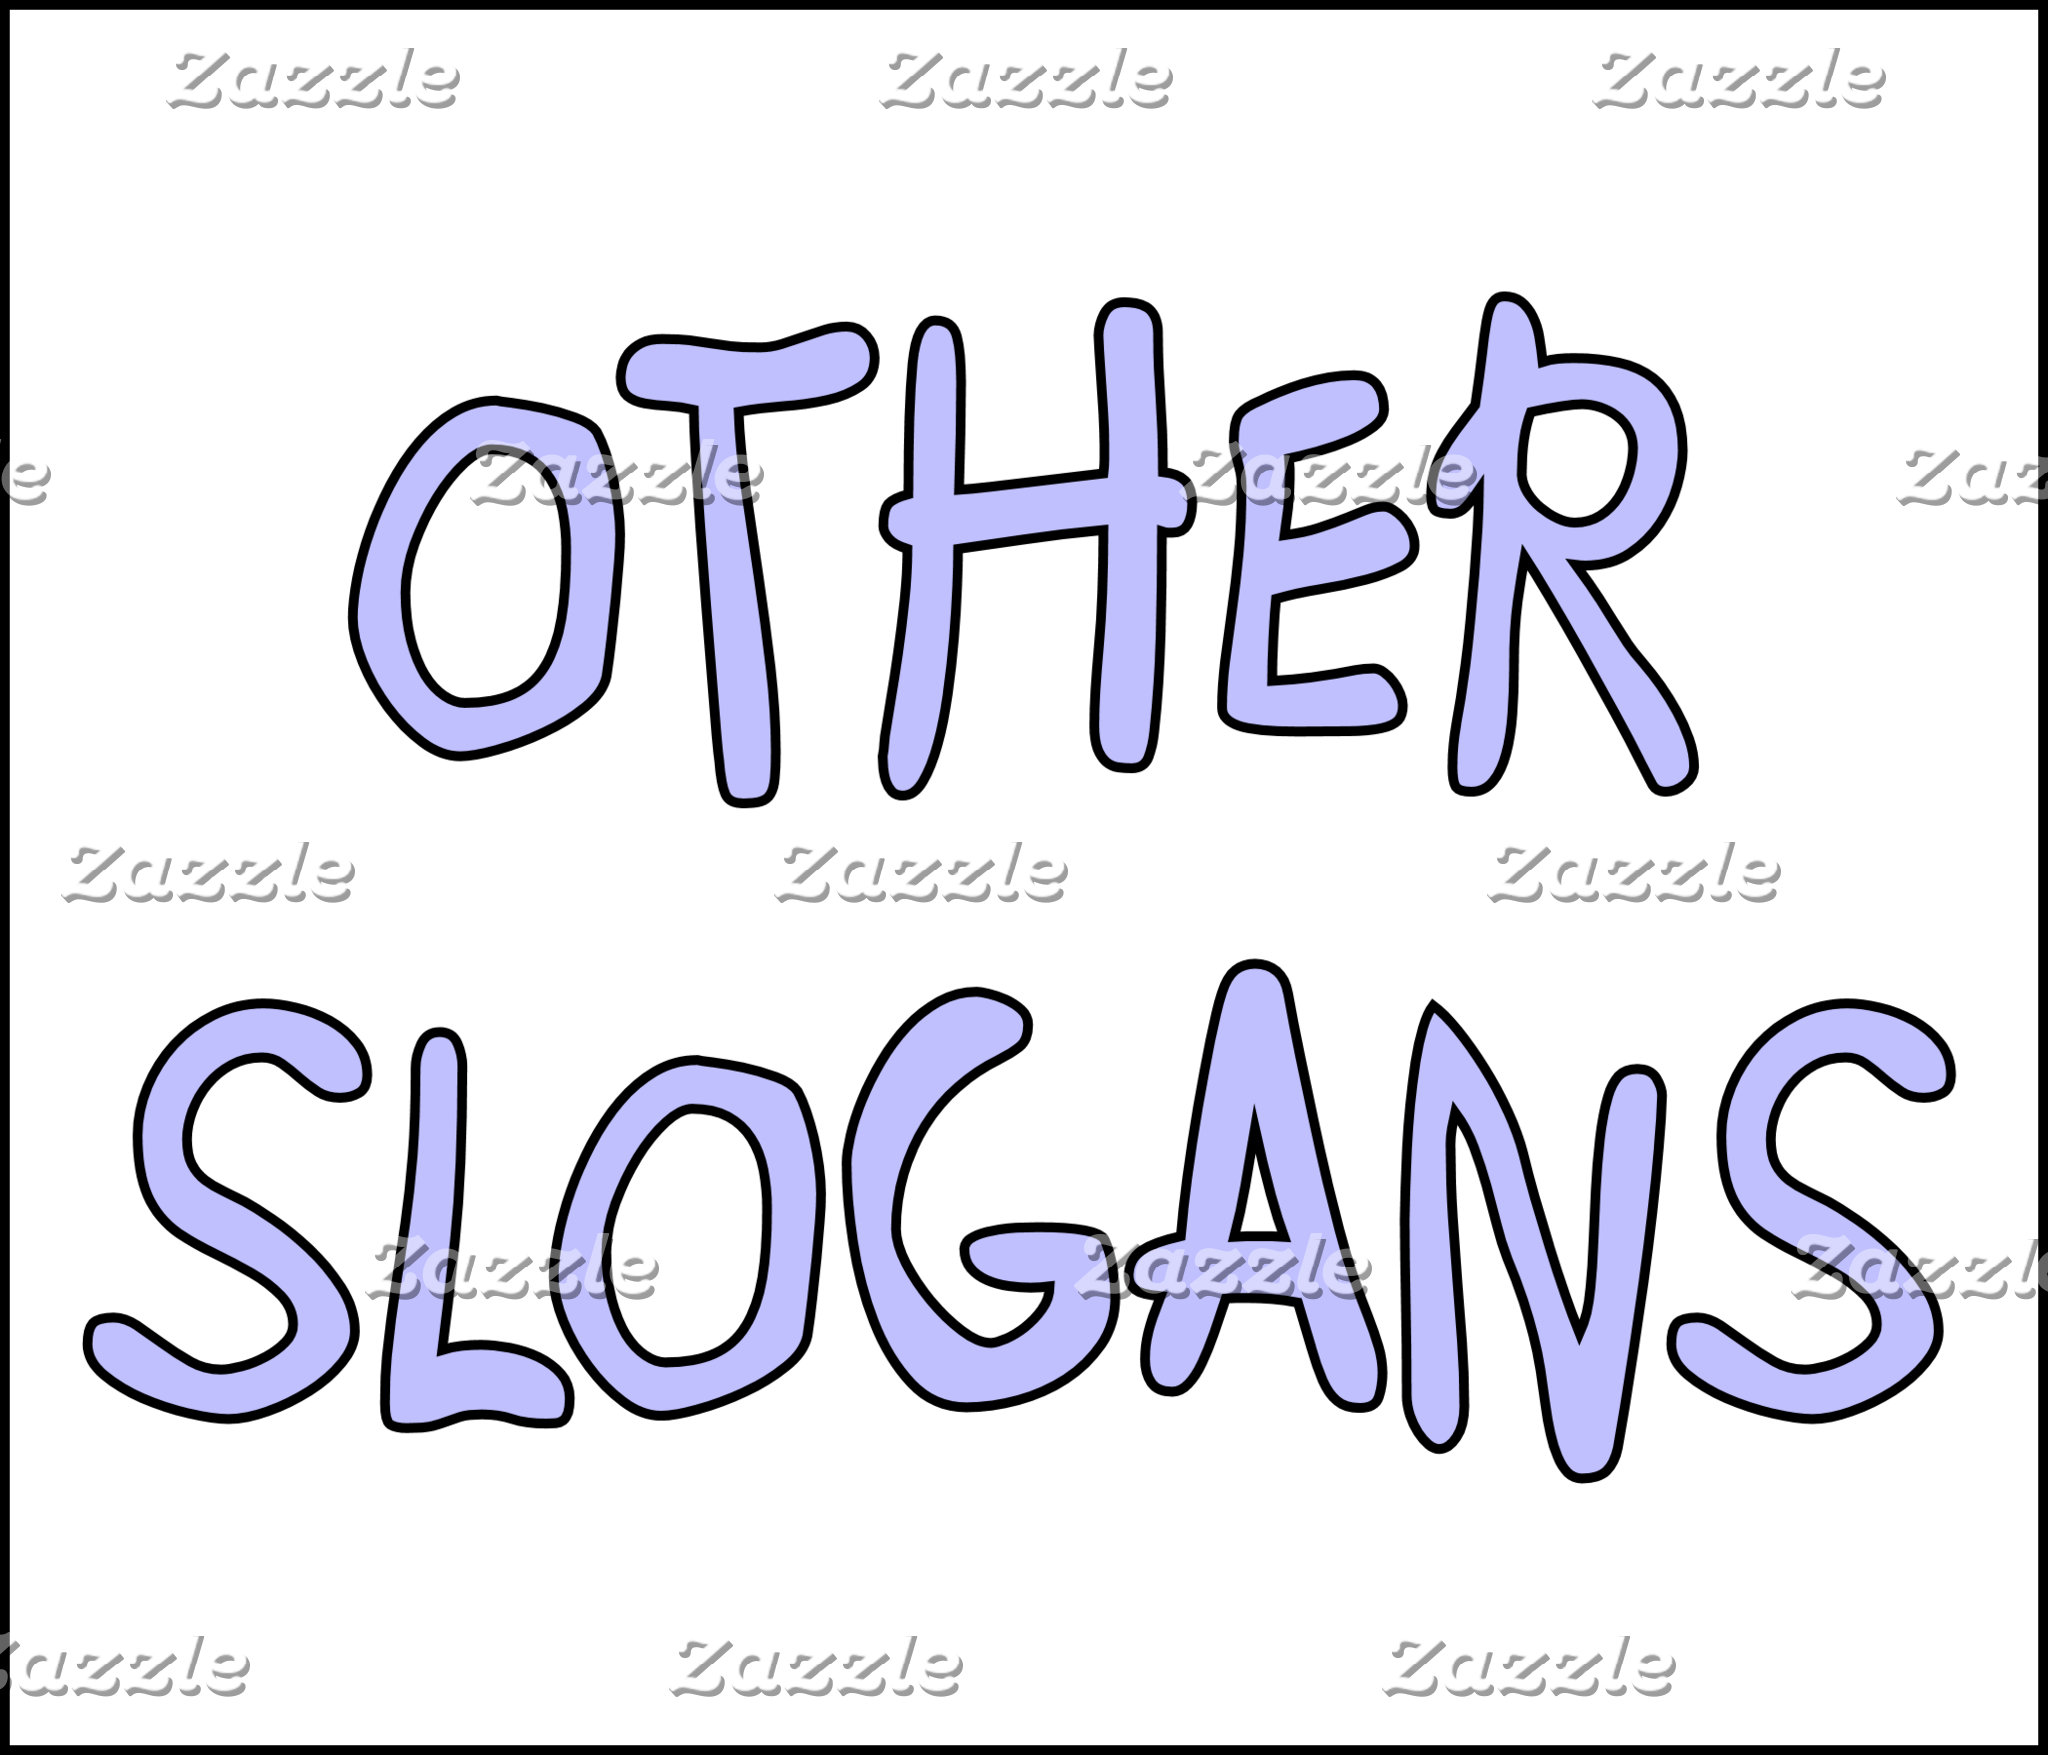 Other Slogans